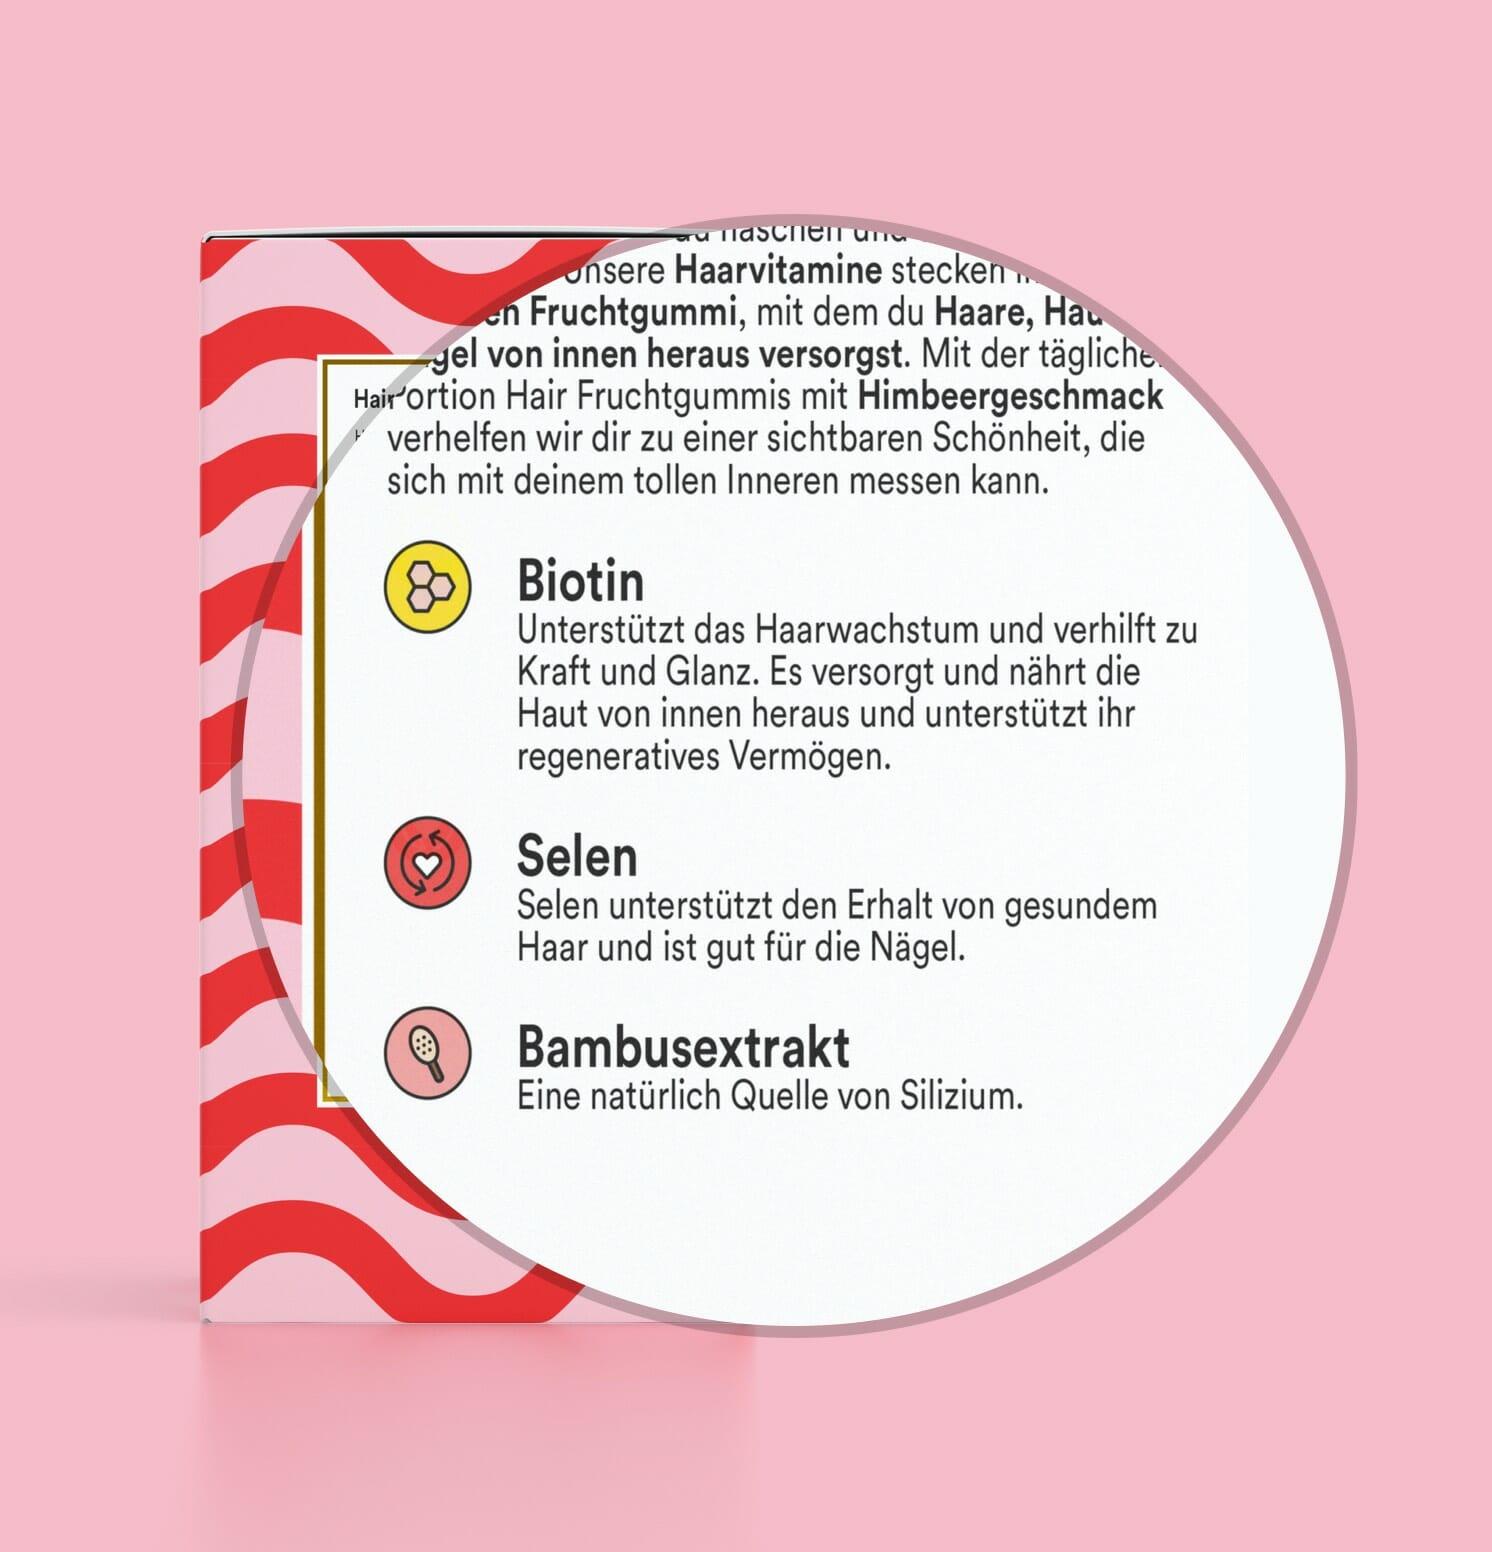 Vitamine für das Haar - Haarvitamine - Biotin - Selen - Yummygums Hair & Beauty